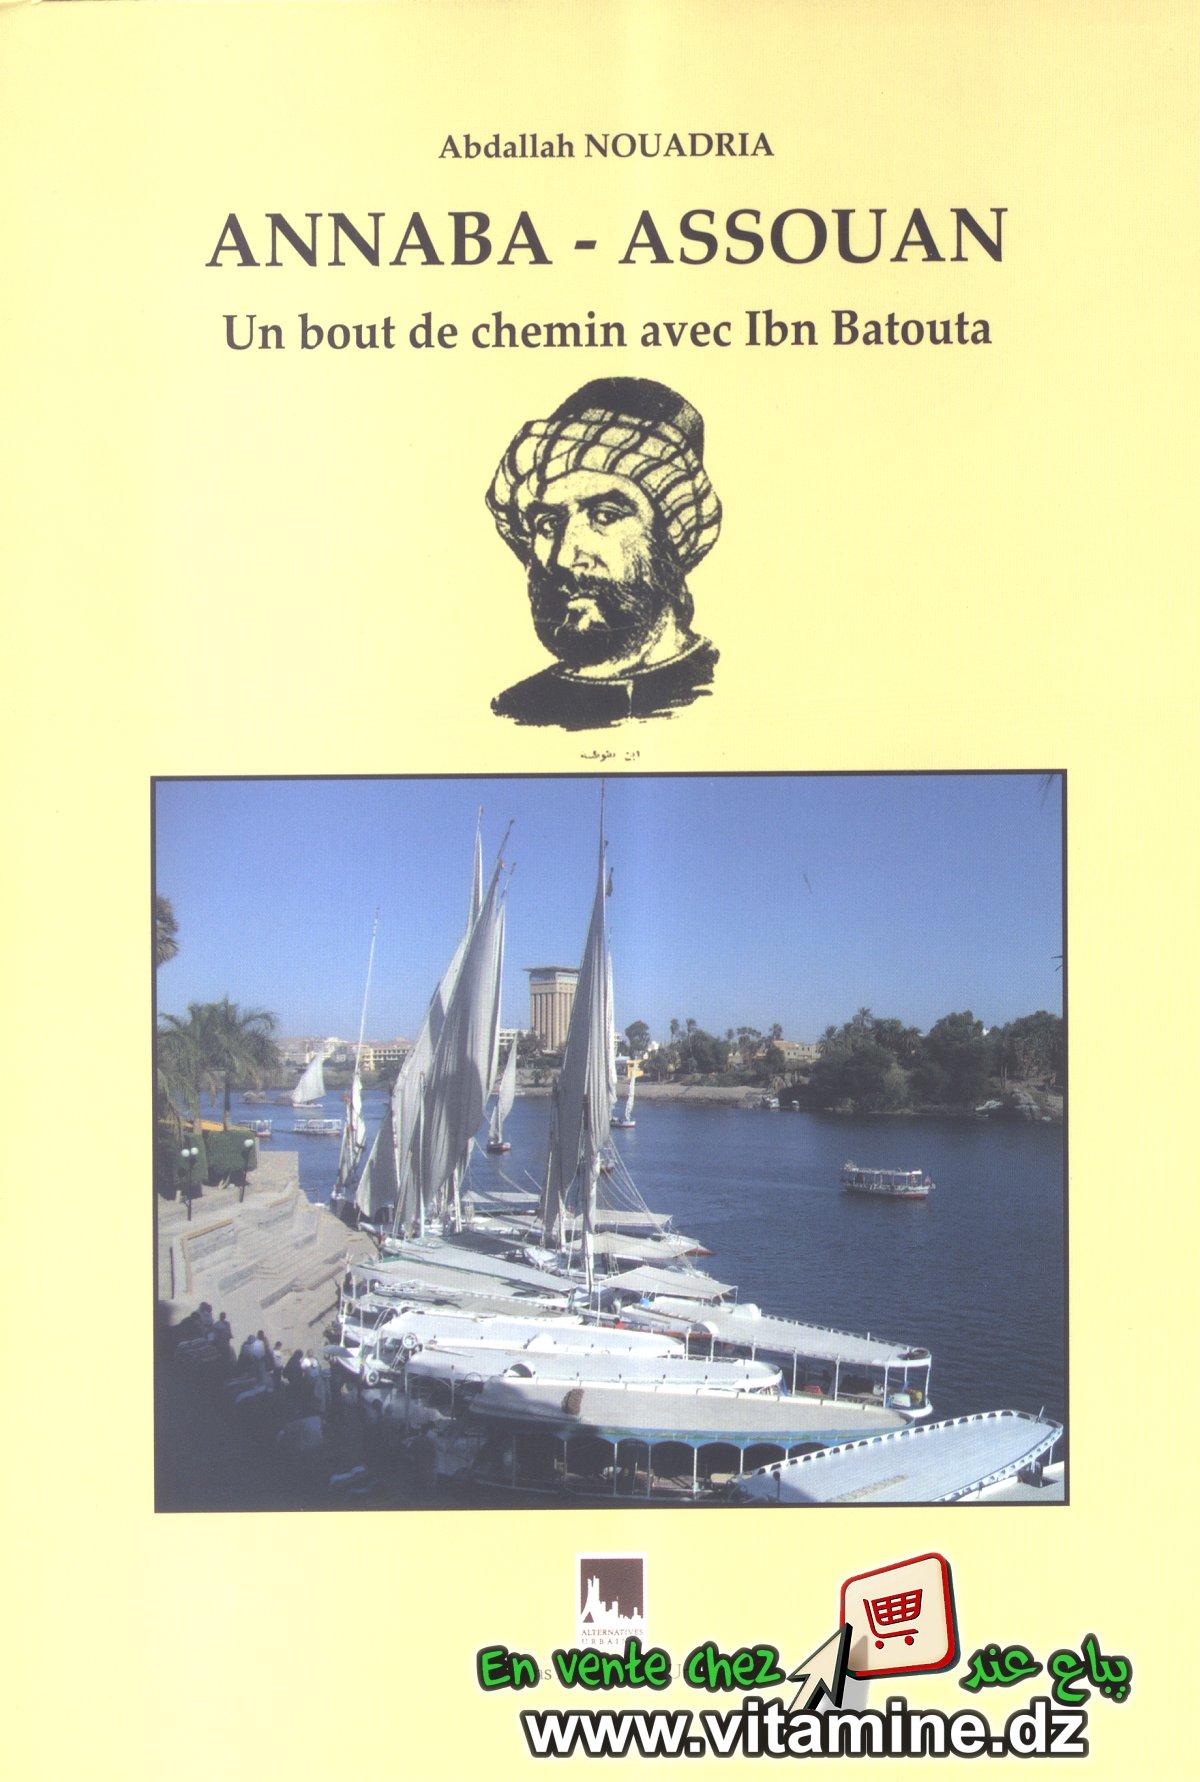 Abdallah Nouadria - Annaba - Assouan Un bout de chemin avec Ibn Batouta